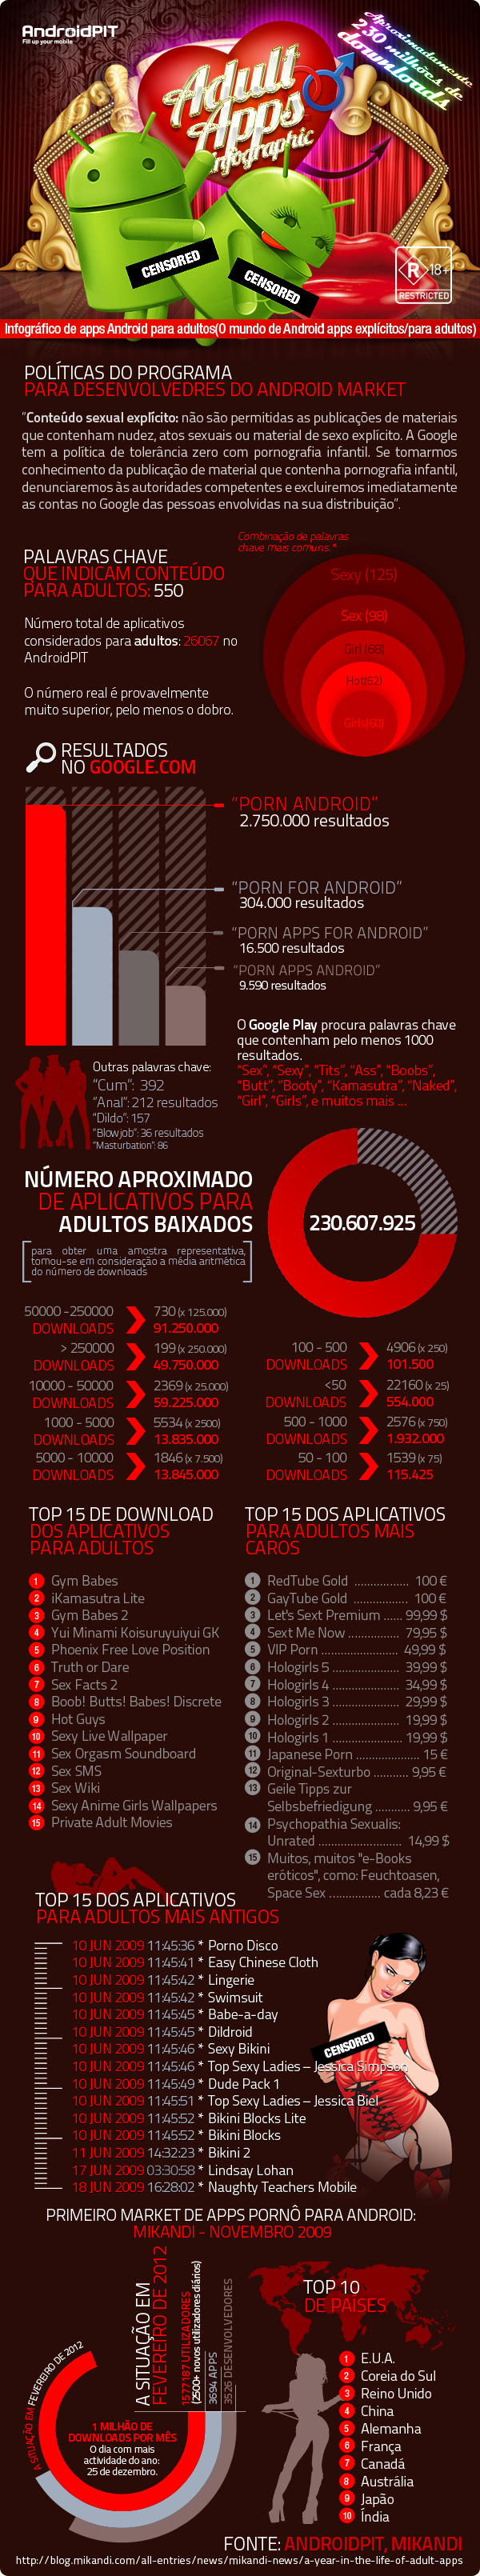 Infográfico de apps adultos.